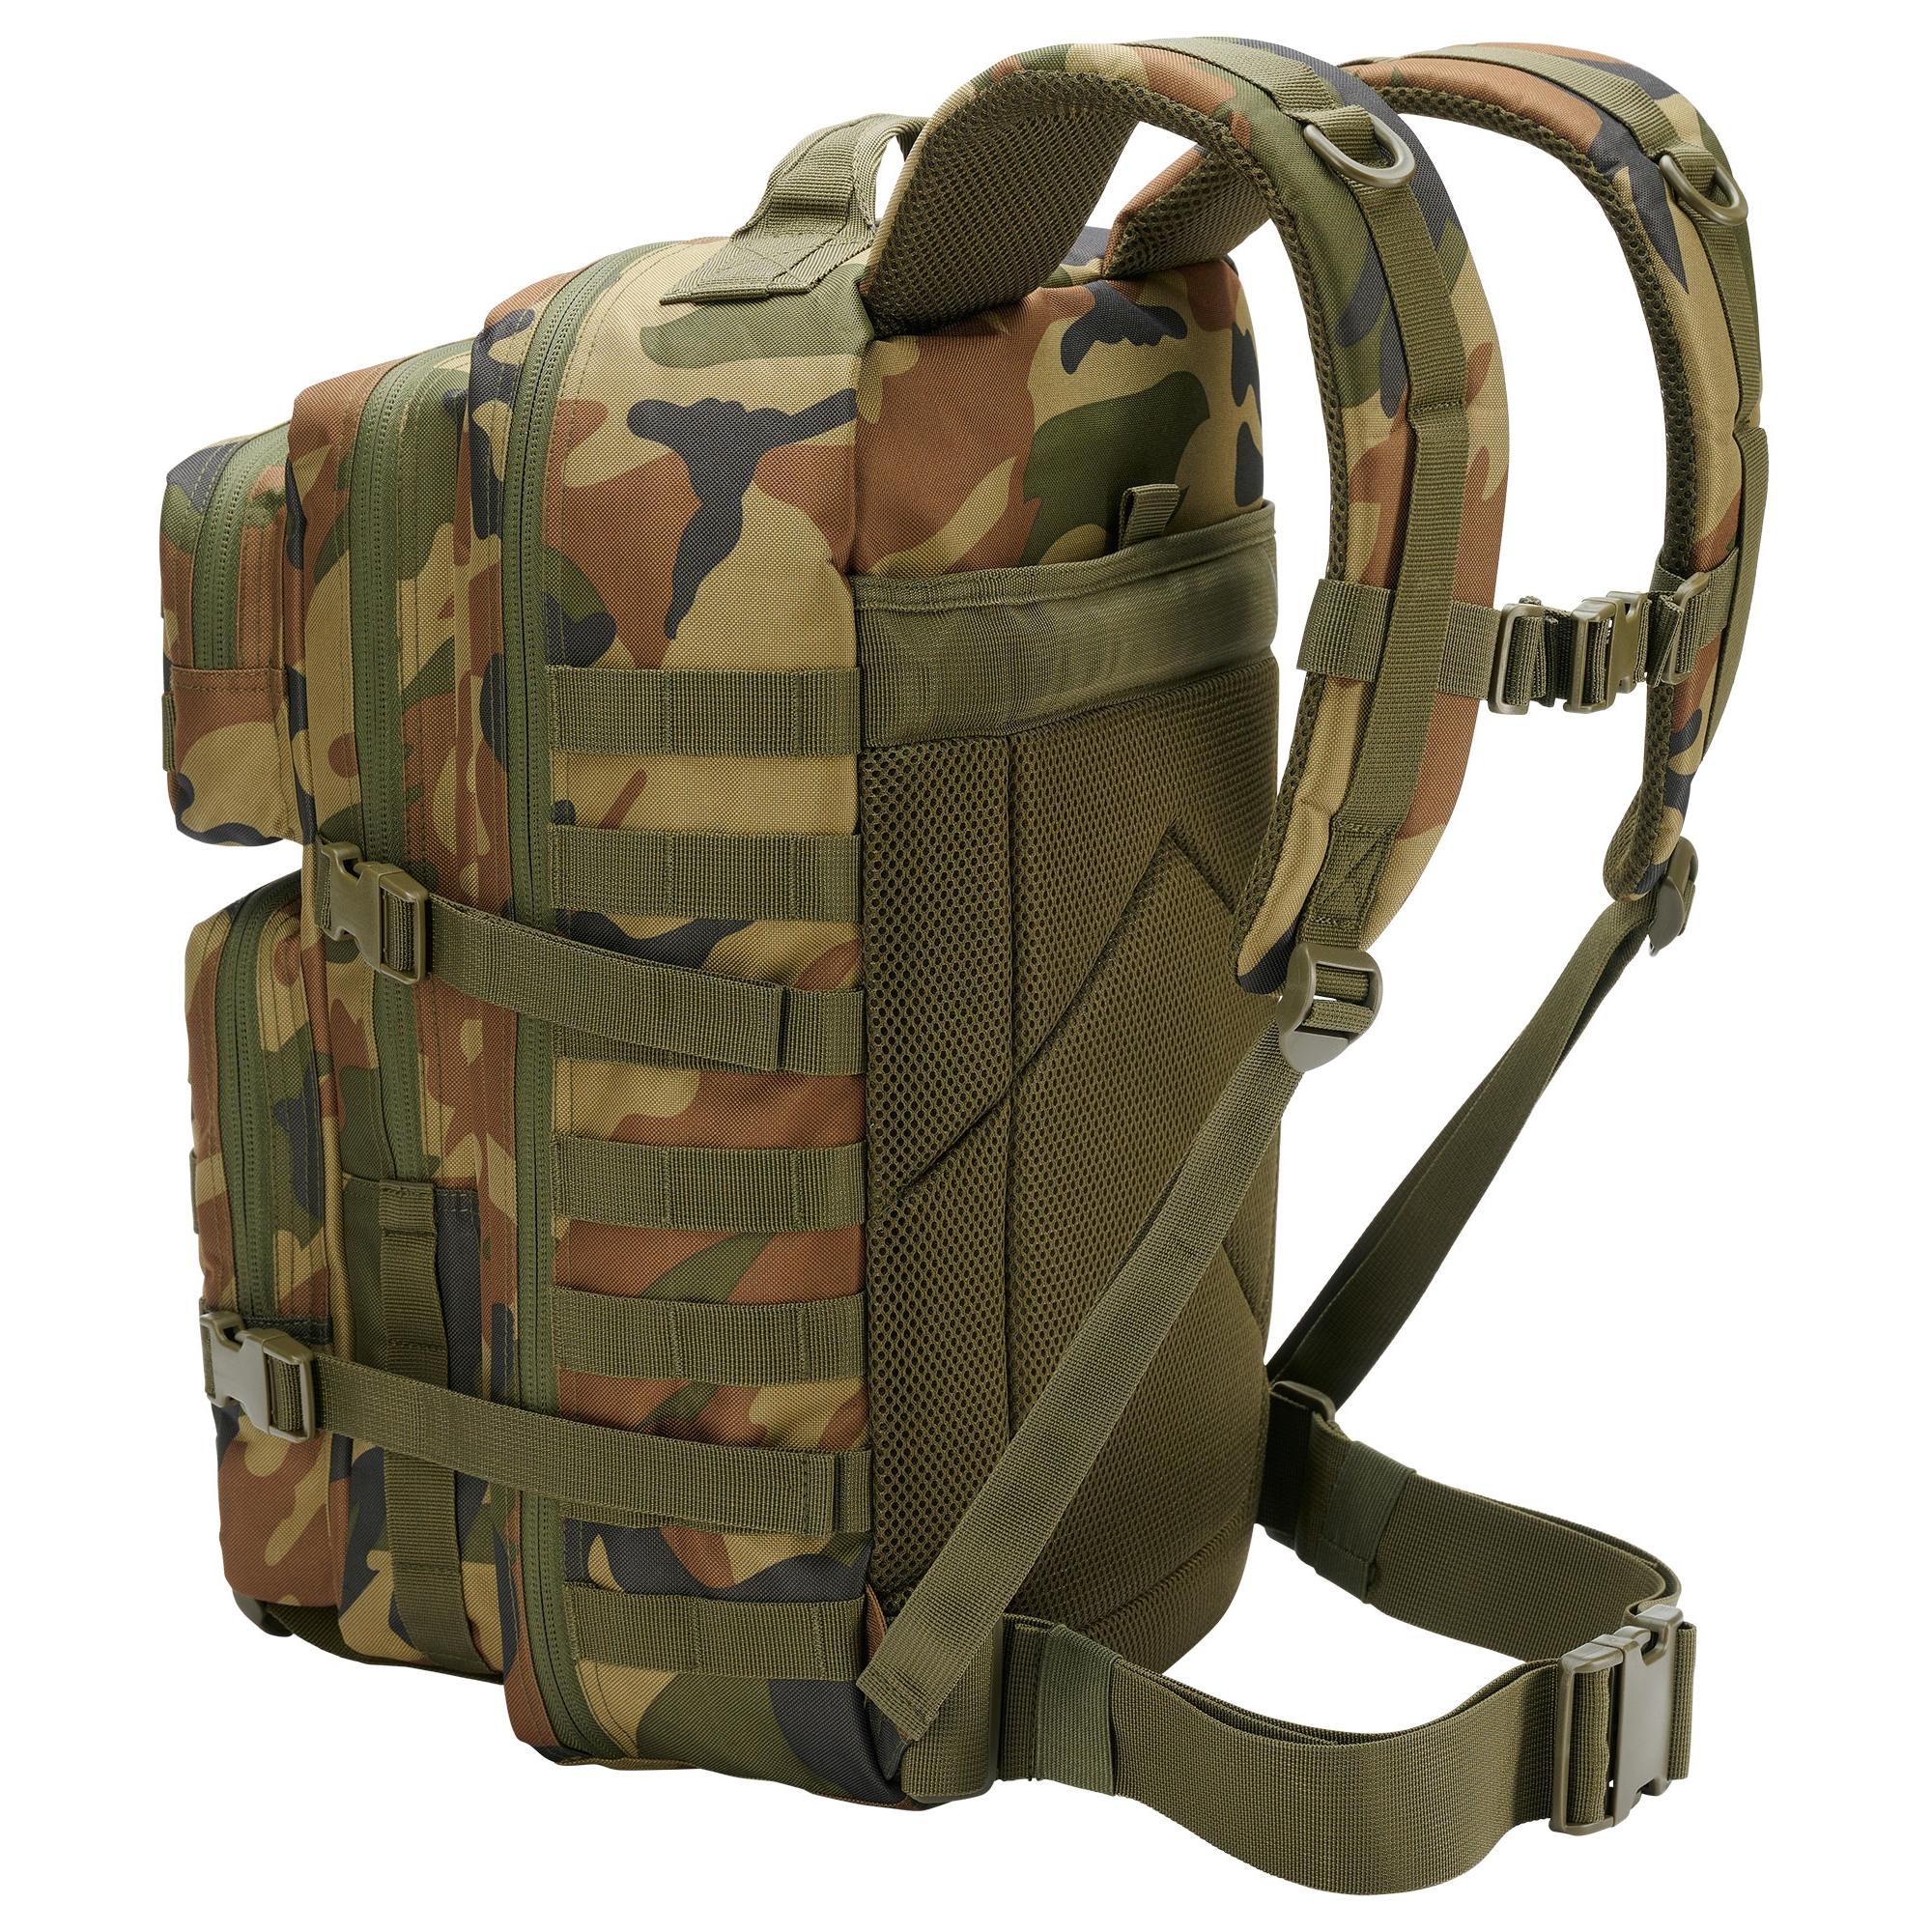 Indexbild 11 - Brandit US Cooper Rucksack Molle Backpack Bundeswehr Armee Wandern Reise Tactica